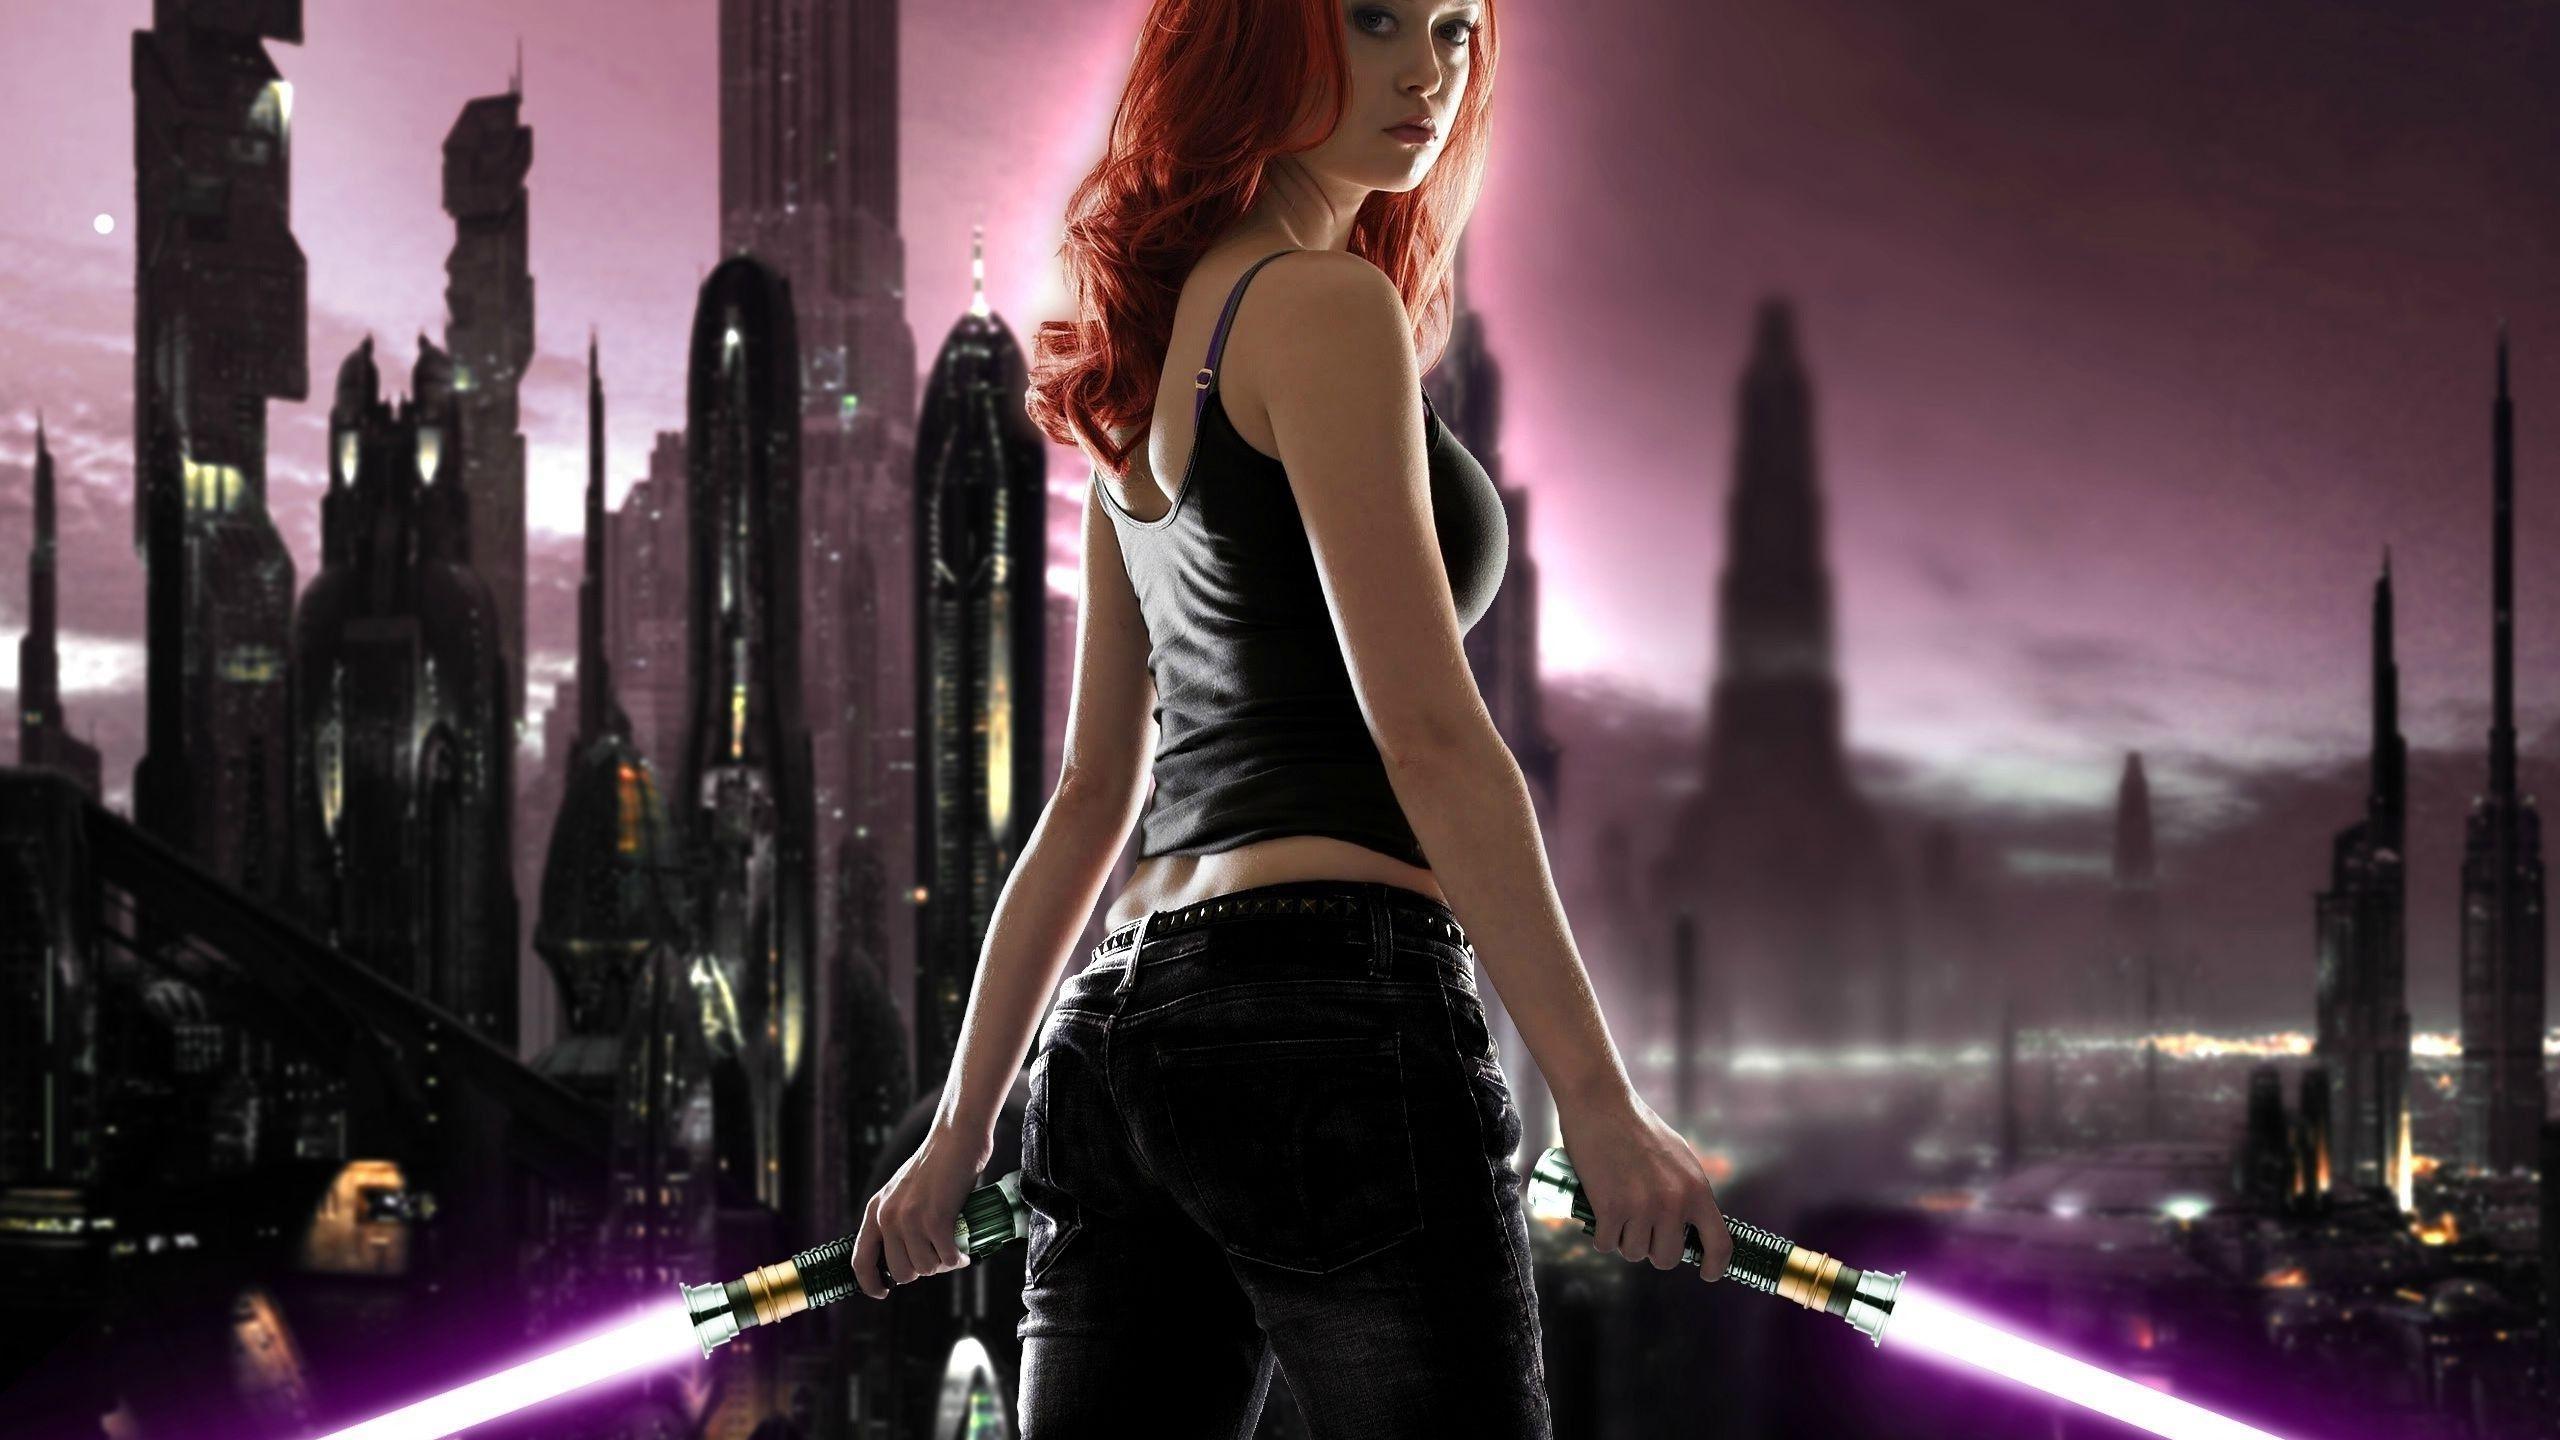 Kylo Ren, <b>Star Wars</b>: The Force Awakens